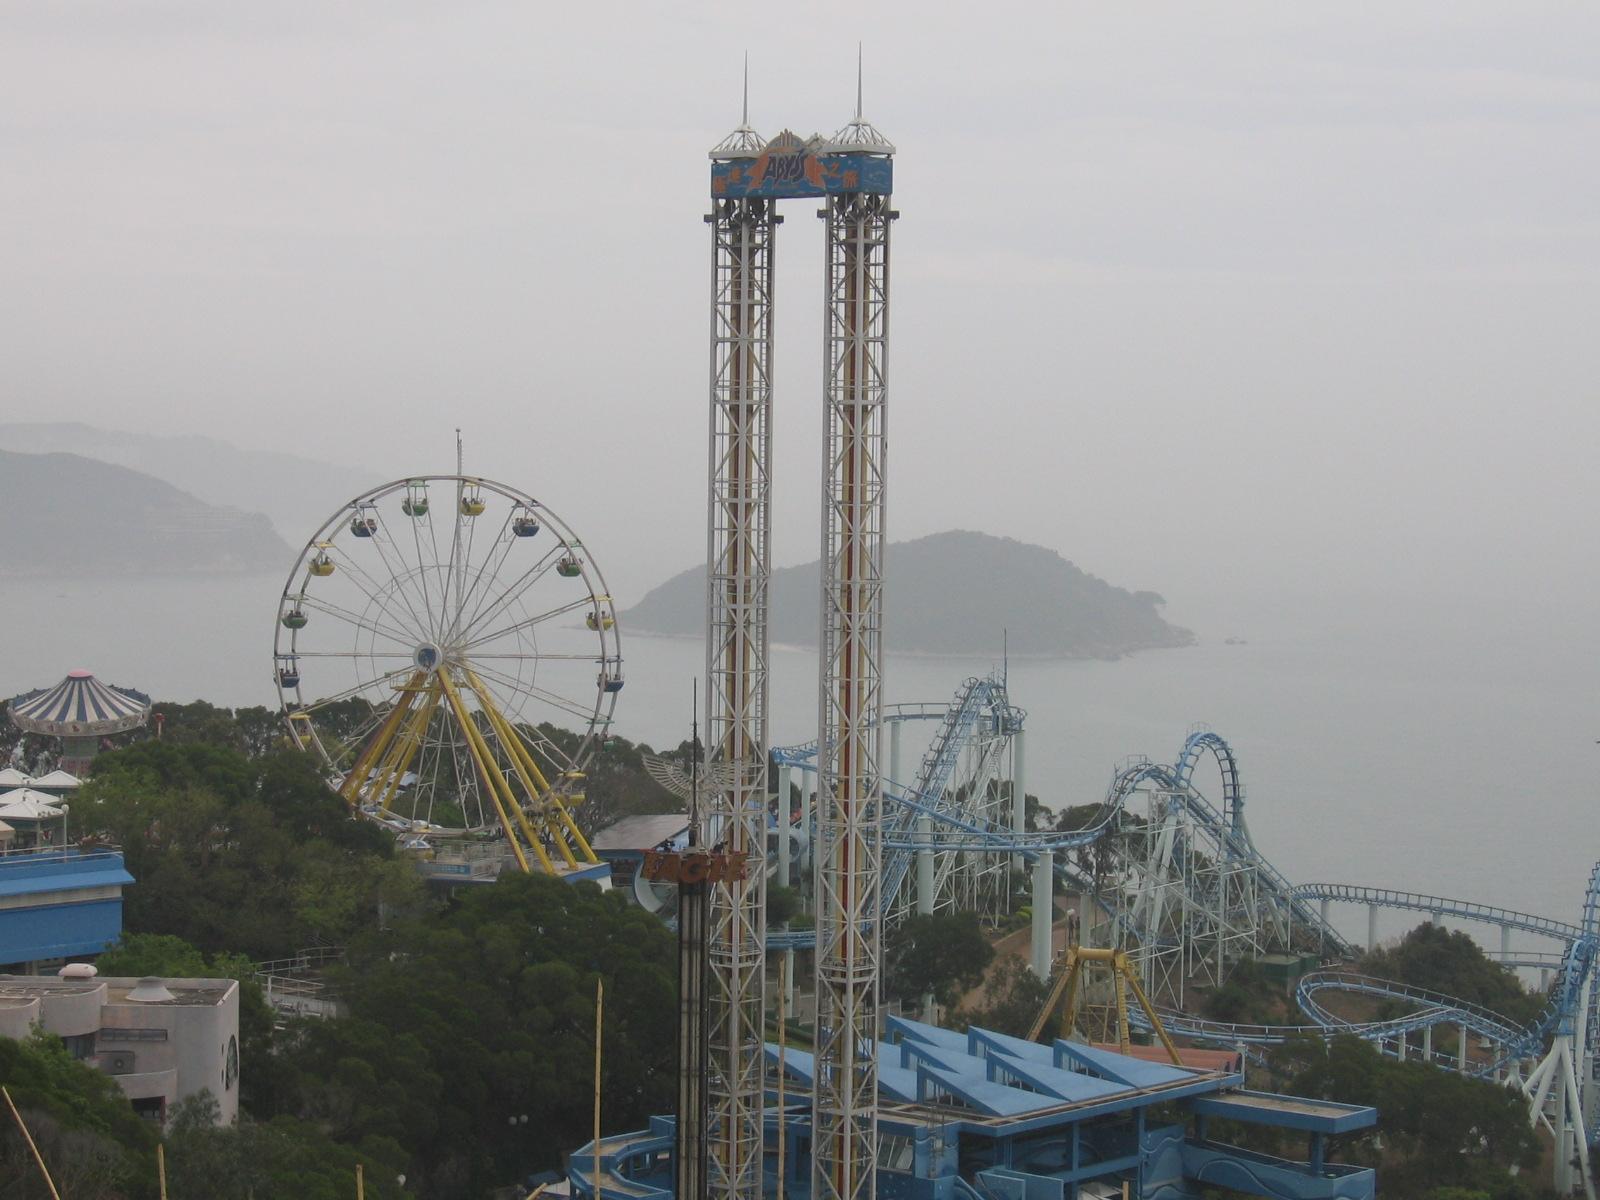 ocean park single girls 253 homes for sale in ocean park, wa browse through 253 ocean park real estate mls listings.